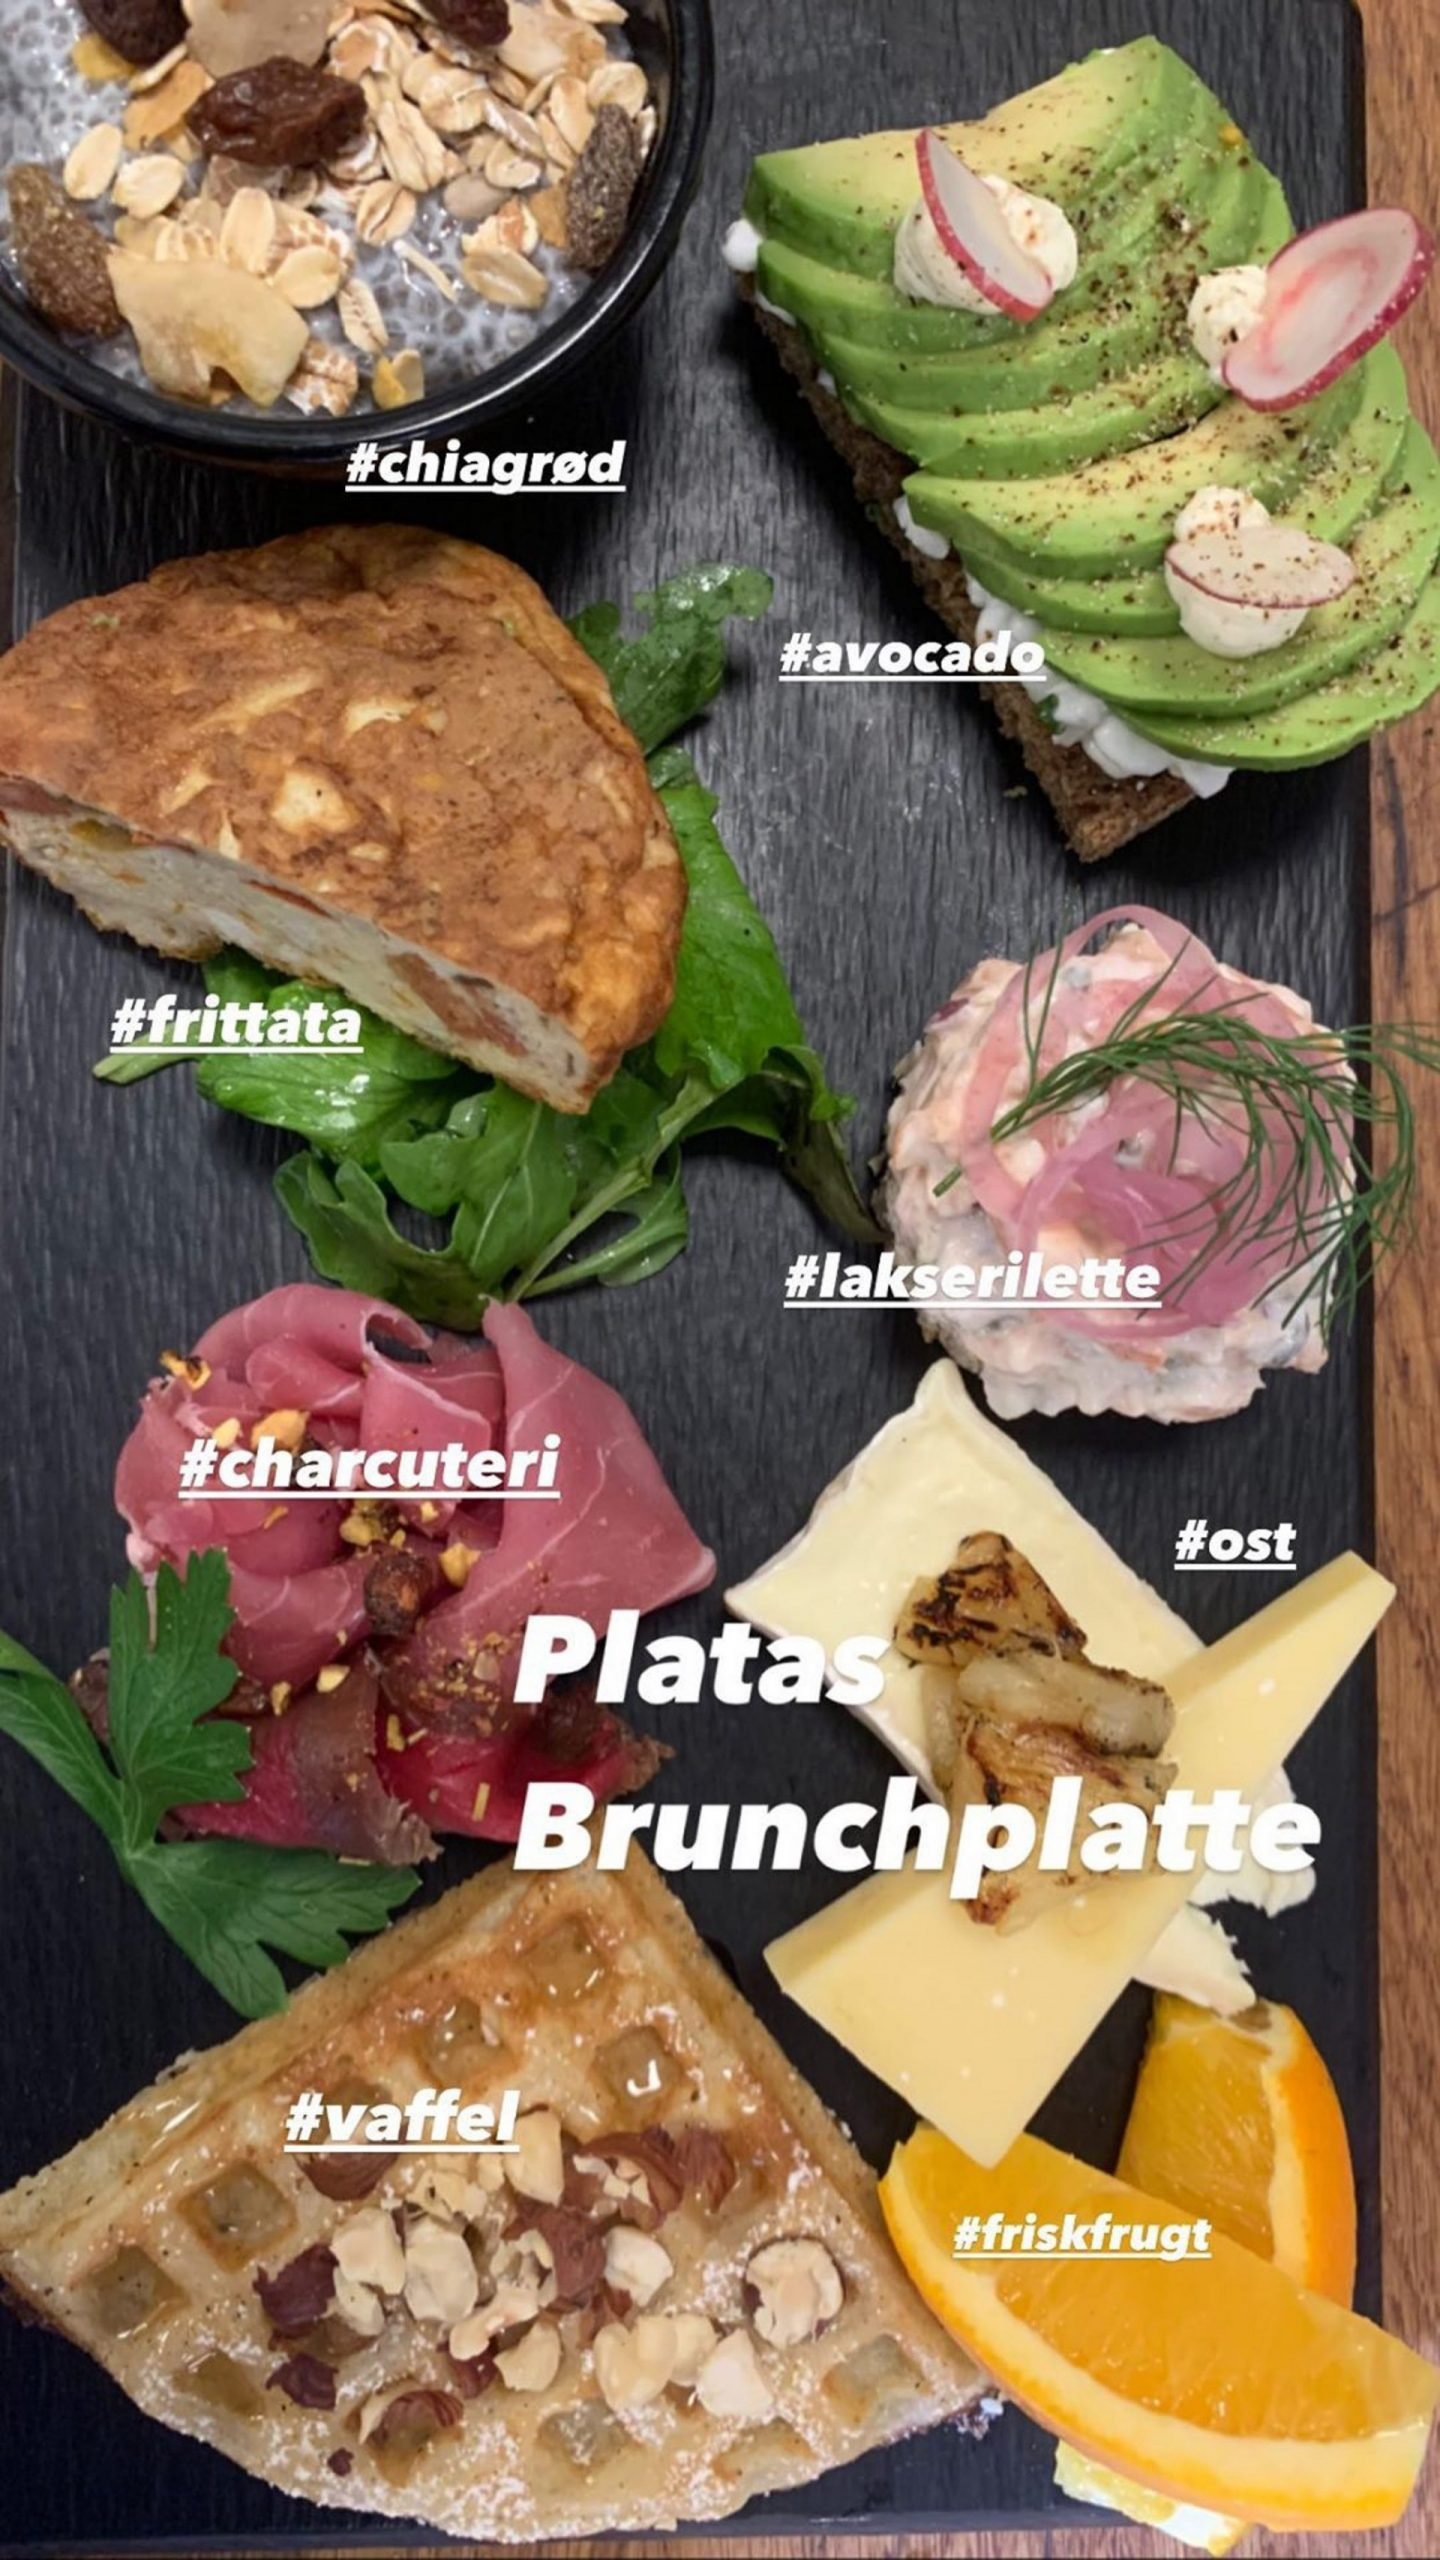 Bar Plata: Nyt koncept med brunch